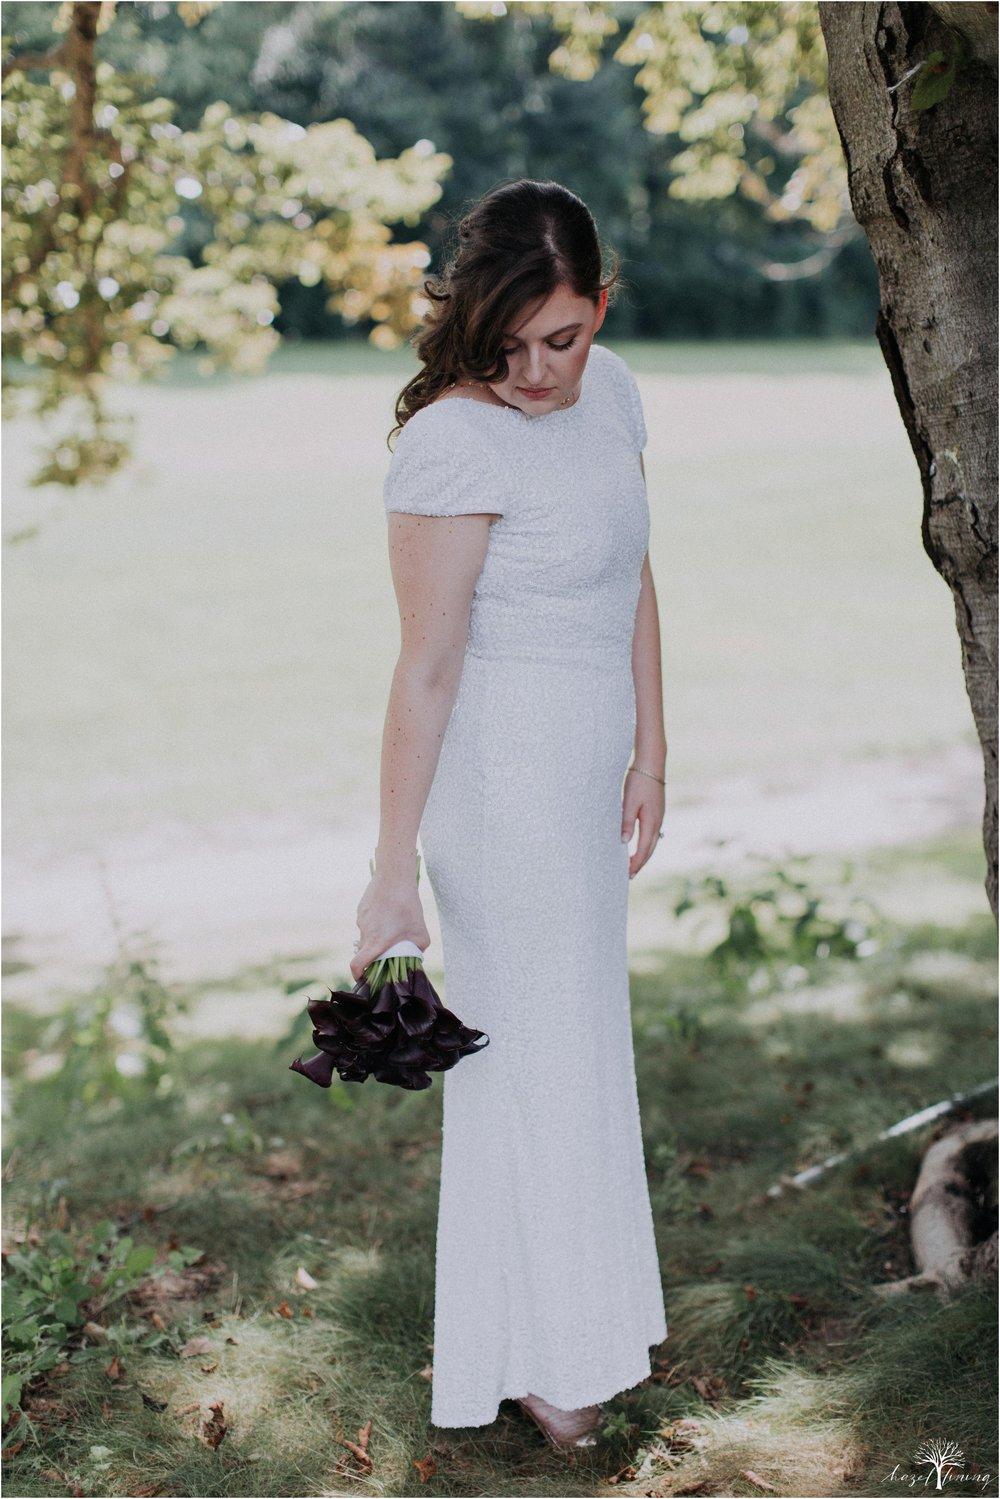 elizabeth-doelp-andrew-foreback-middletown-country-club-summer-langhorne-pennsylvania-wedding-hazel-lining-travel-wedding-elopement-photography_0045.jpg